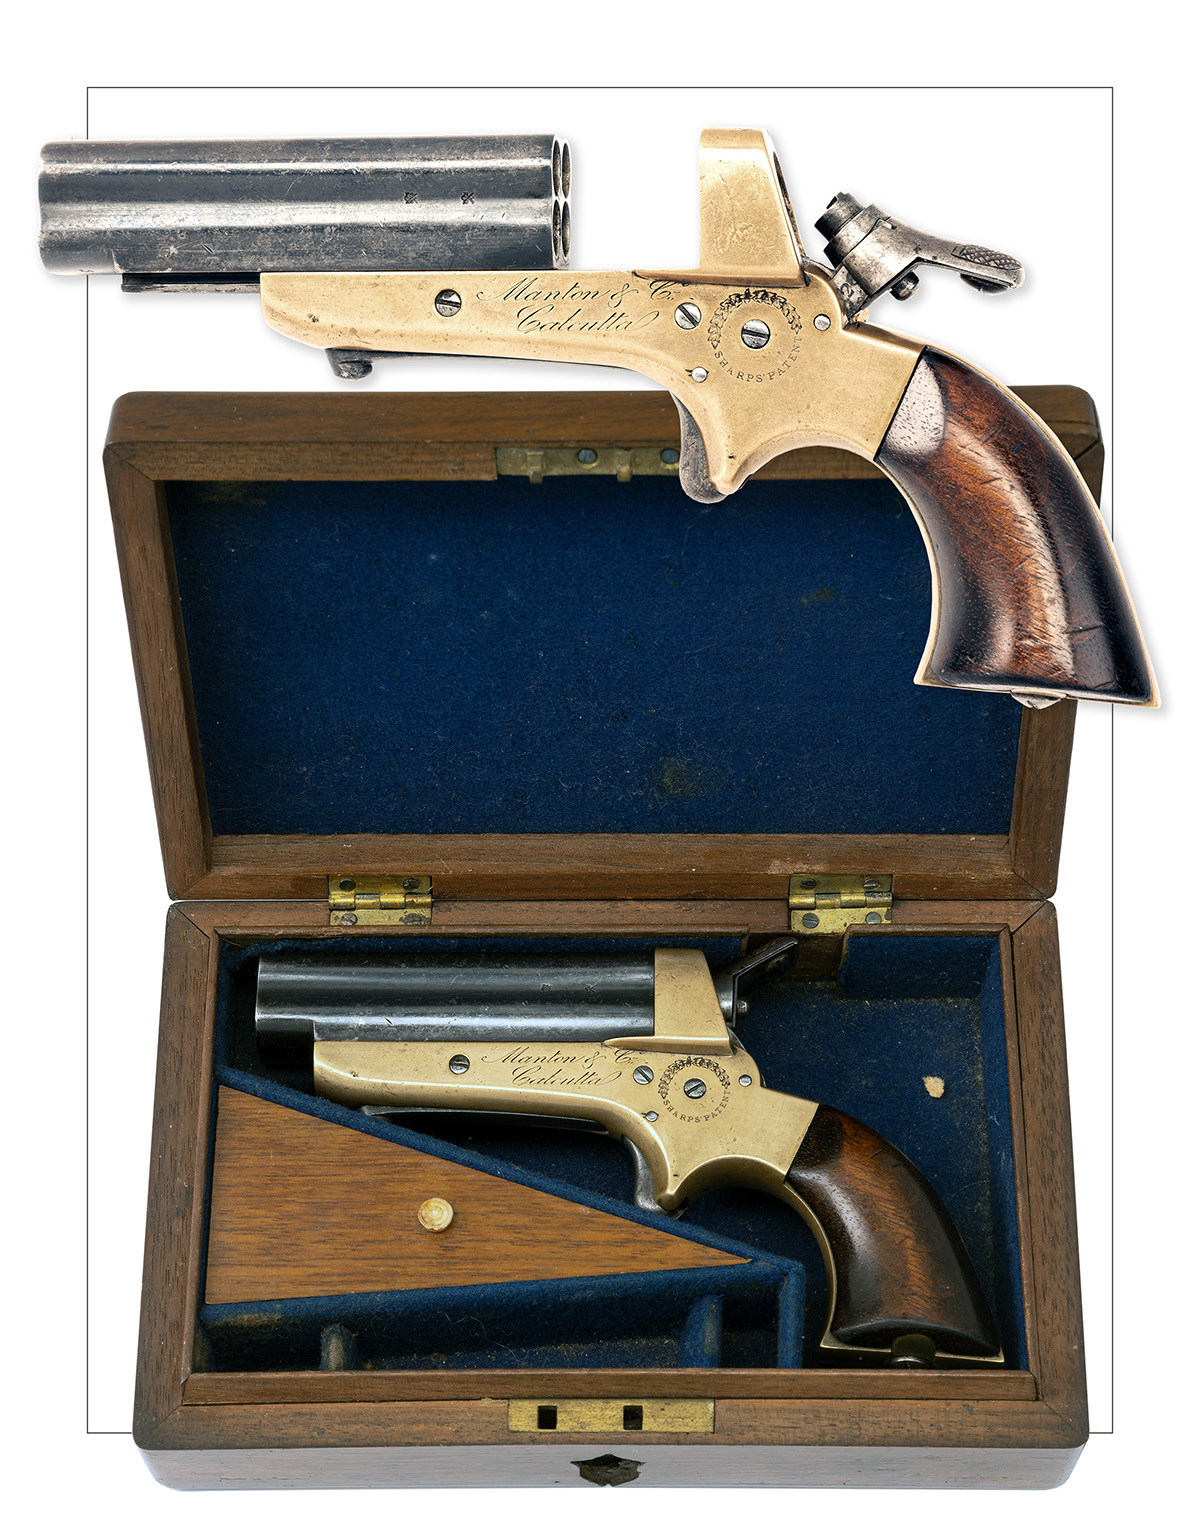 SHARPS, USA FOR MANTON & CO., CALCUTTA A CASED .30 (RIMFIRE) FOUR-BARRELLED DERRINGER PISTOL, - Image 5 of 5